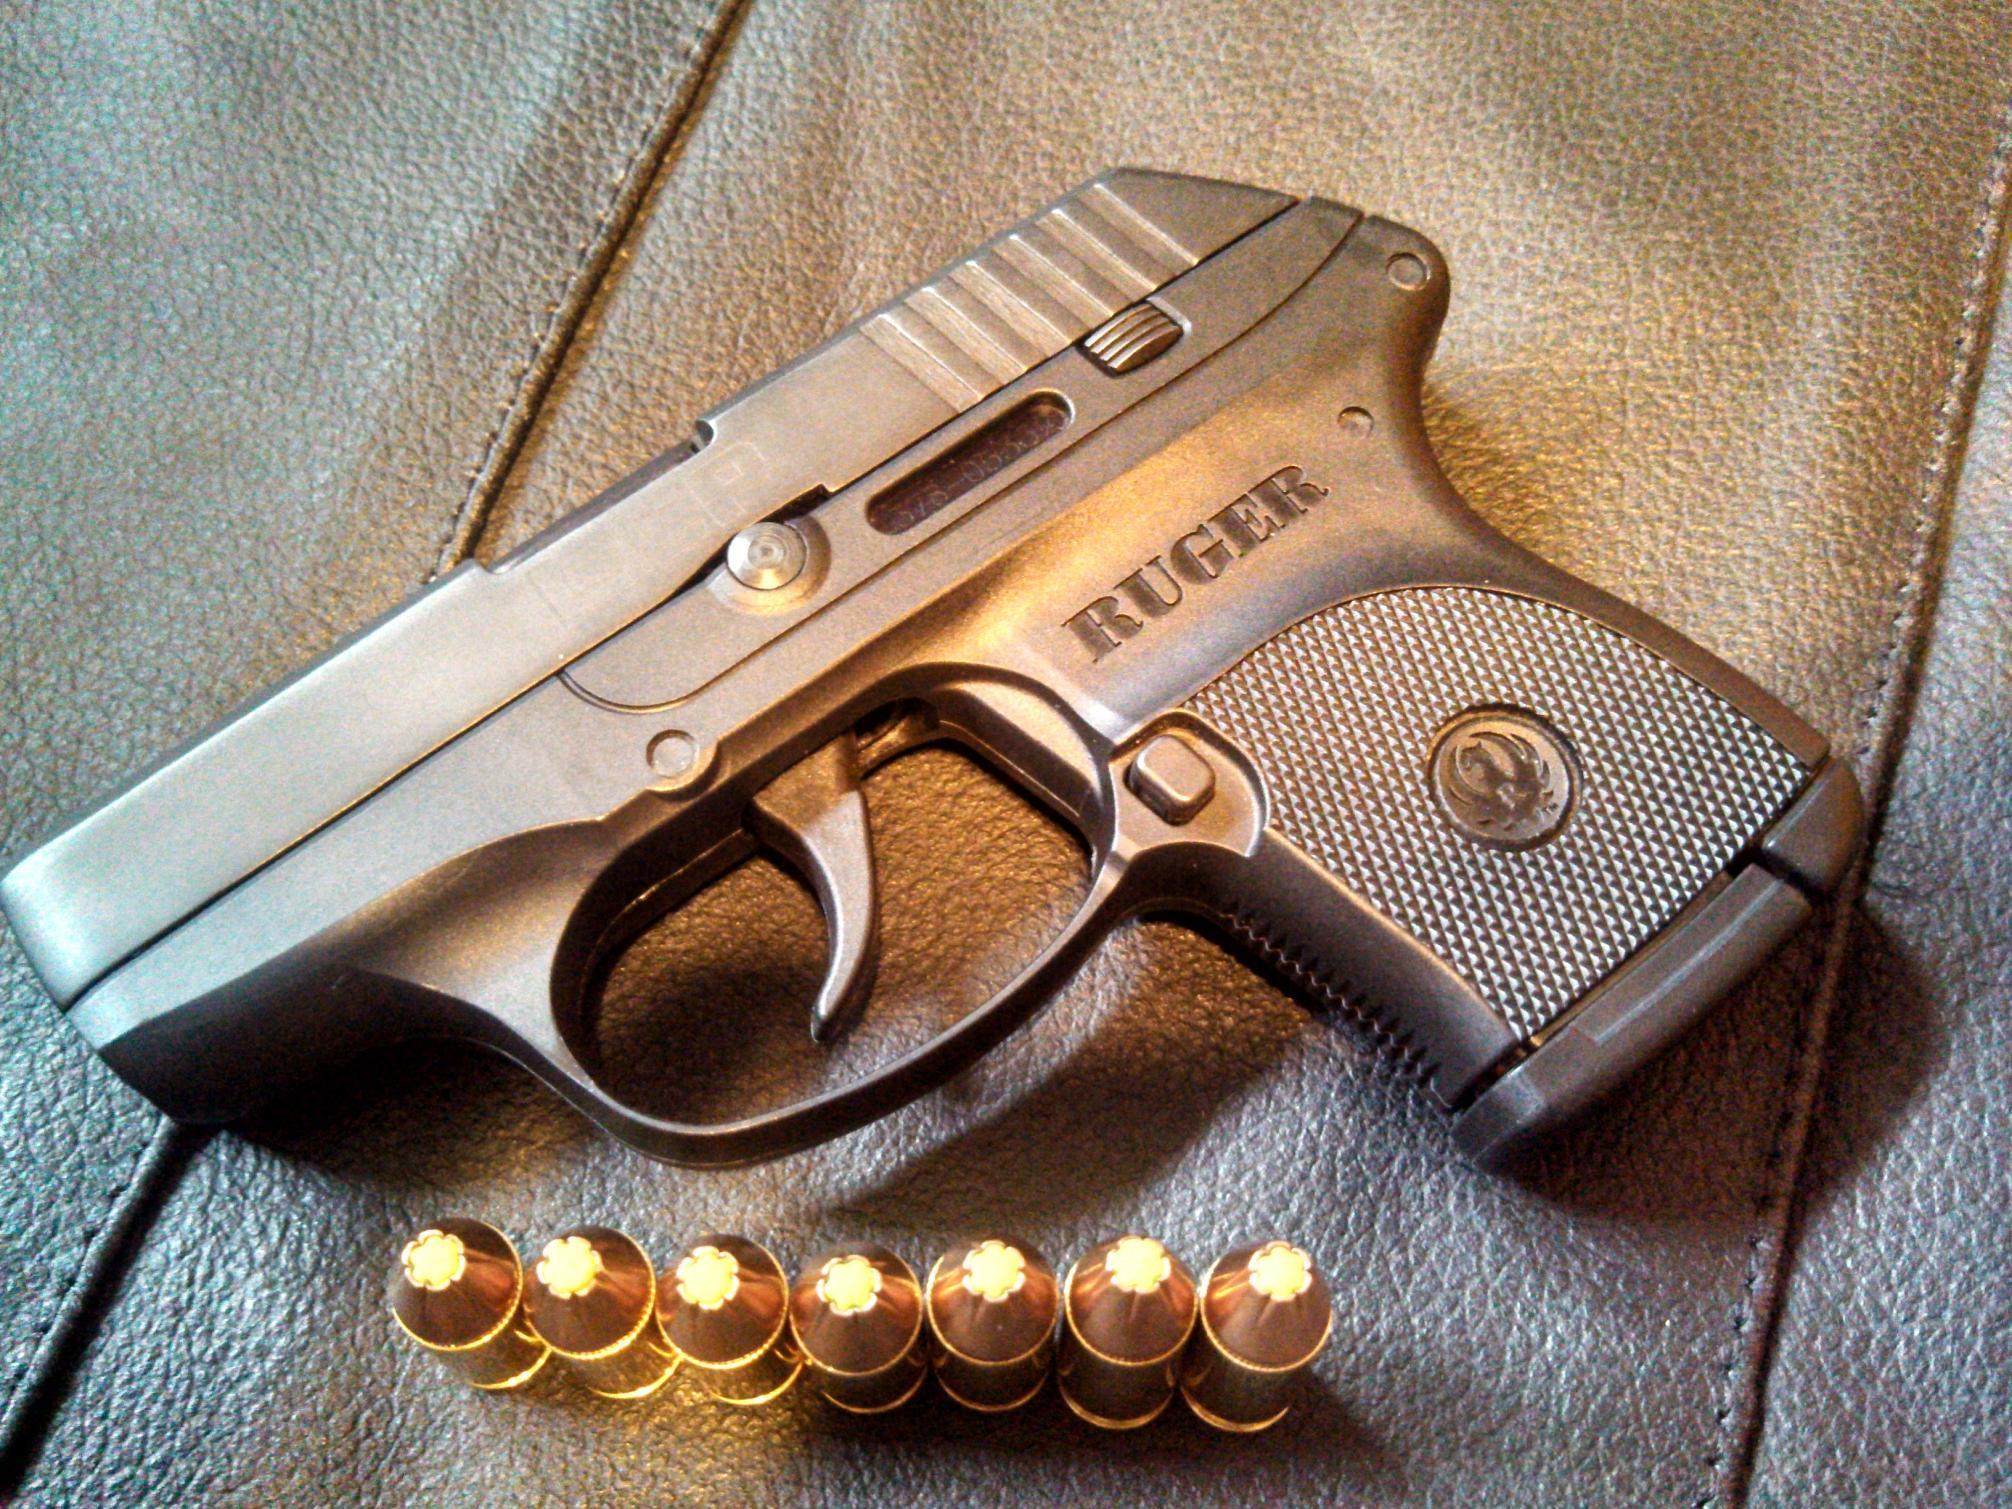 New Gun-img_20130702_175121_869.jpg